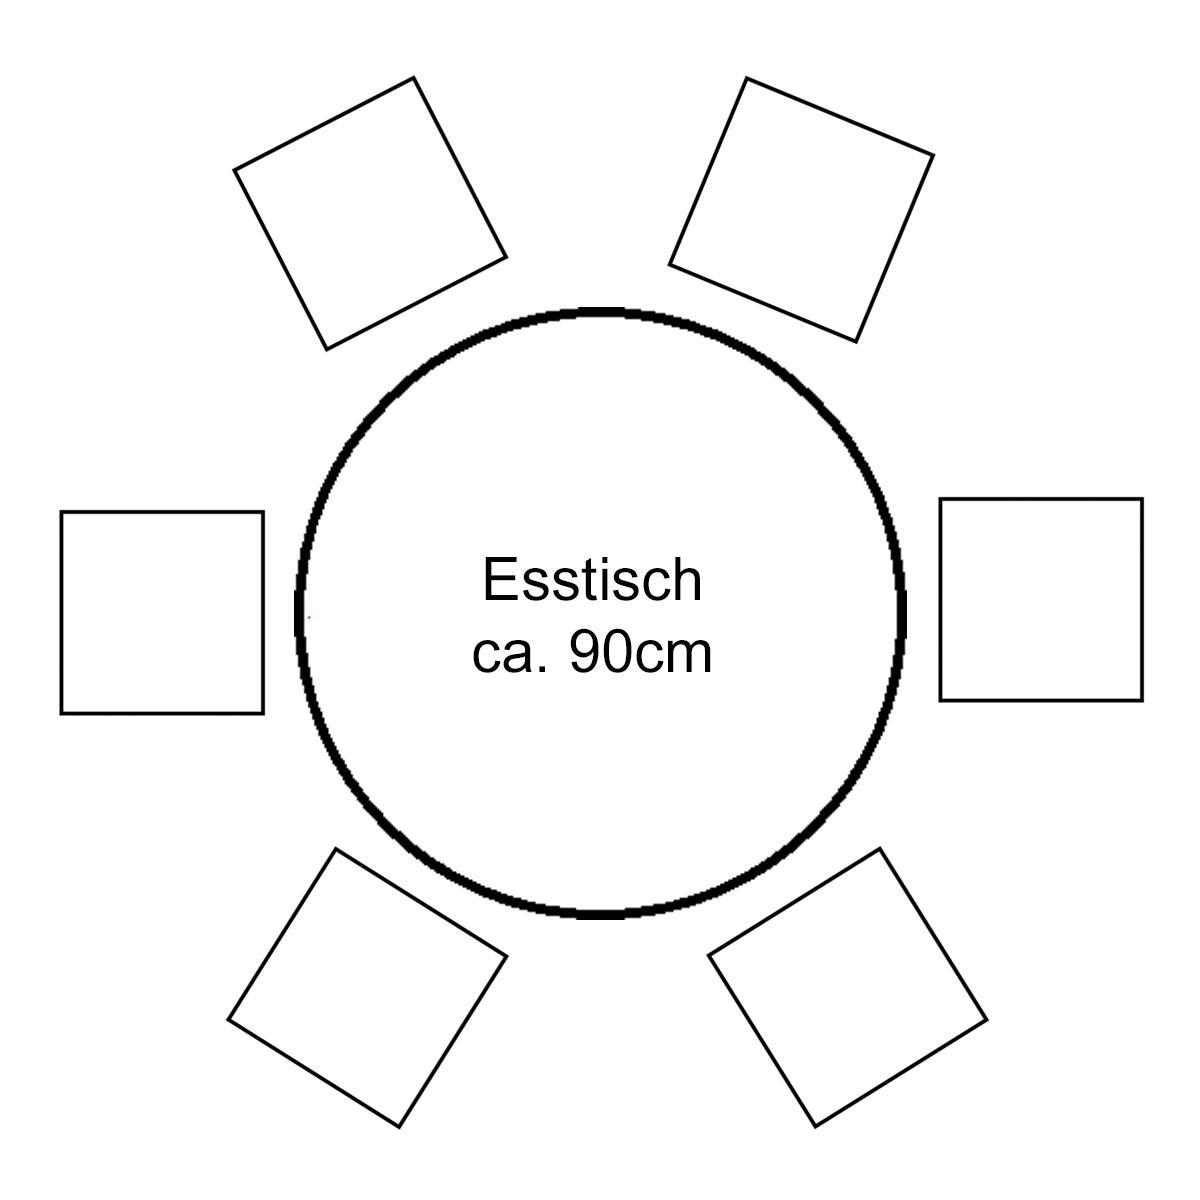 Platzbedarf Esstisch 8 Personen